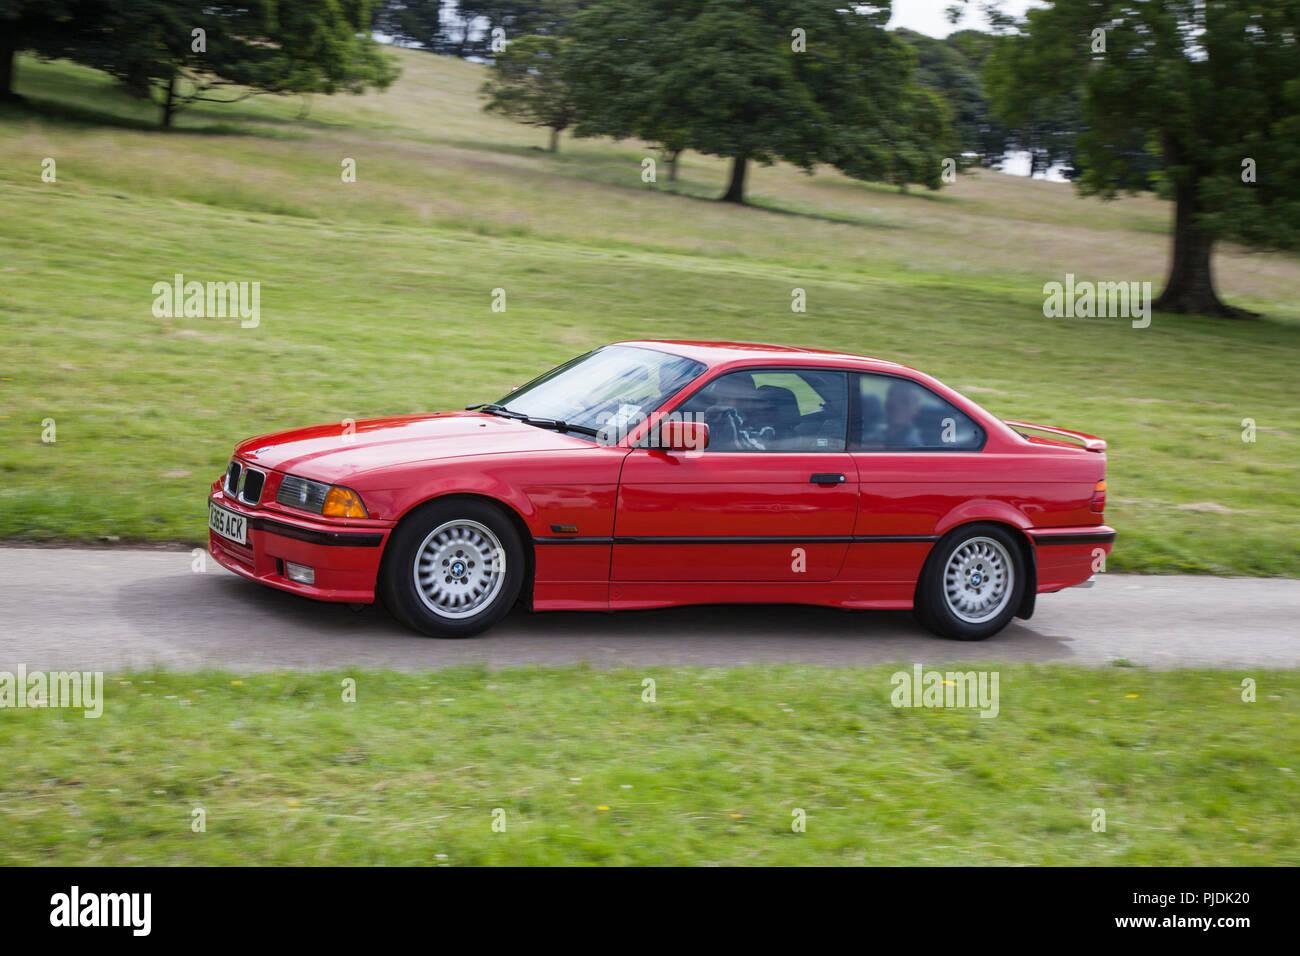 Red 1993 BMW 318 I S Vintage, classic, veteran cars at Carnforth, UK - Stock Image